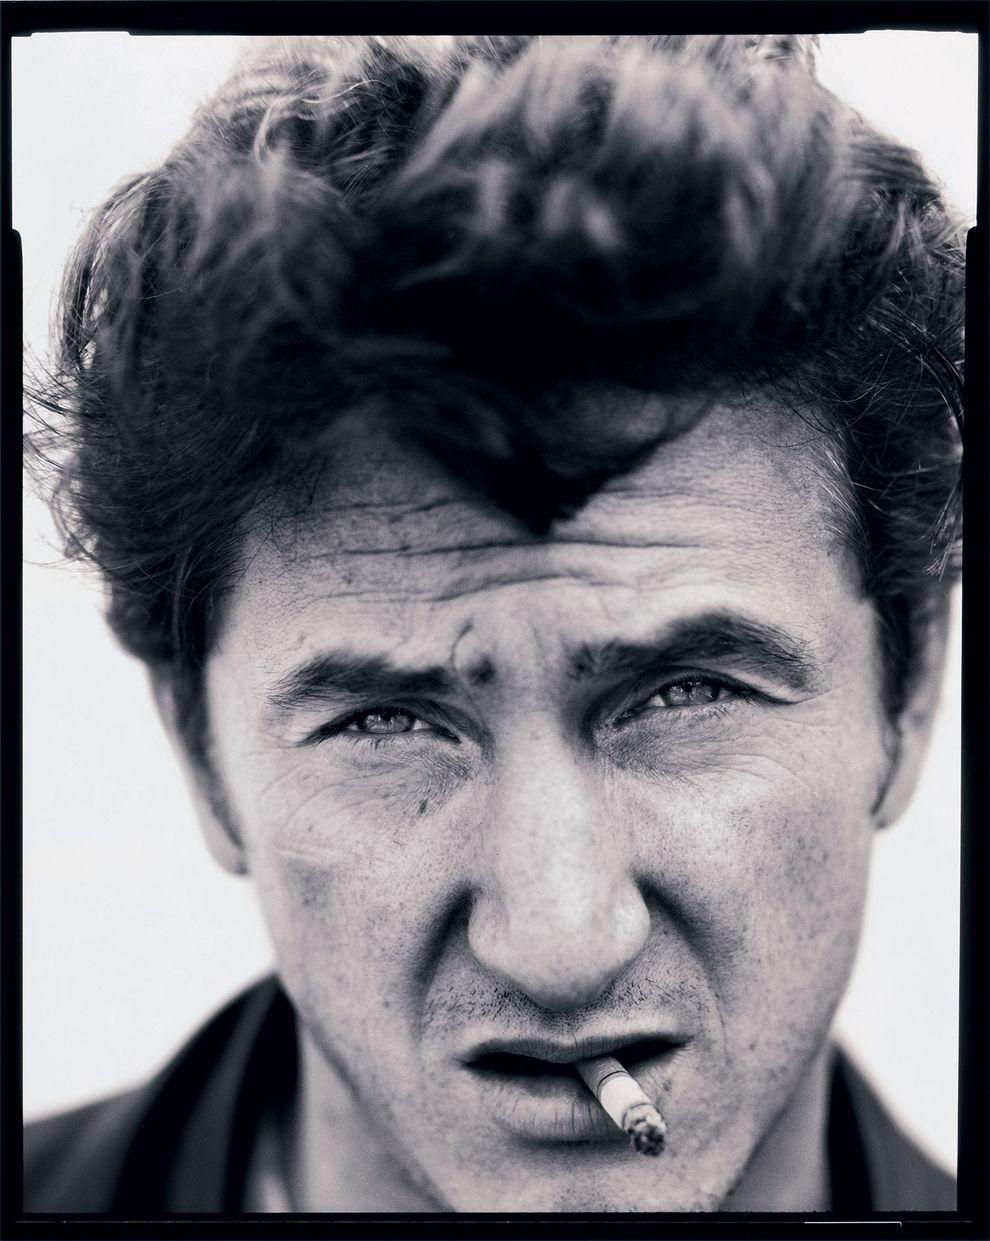 New York City Portrait Photographer | Diego Molina ...